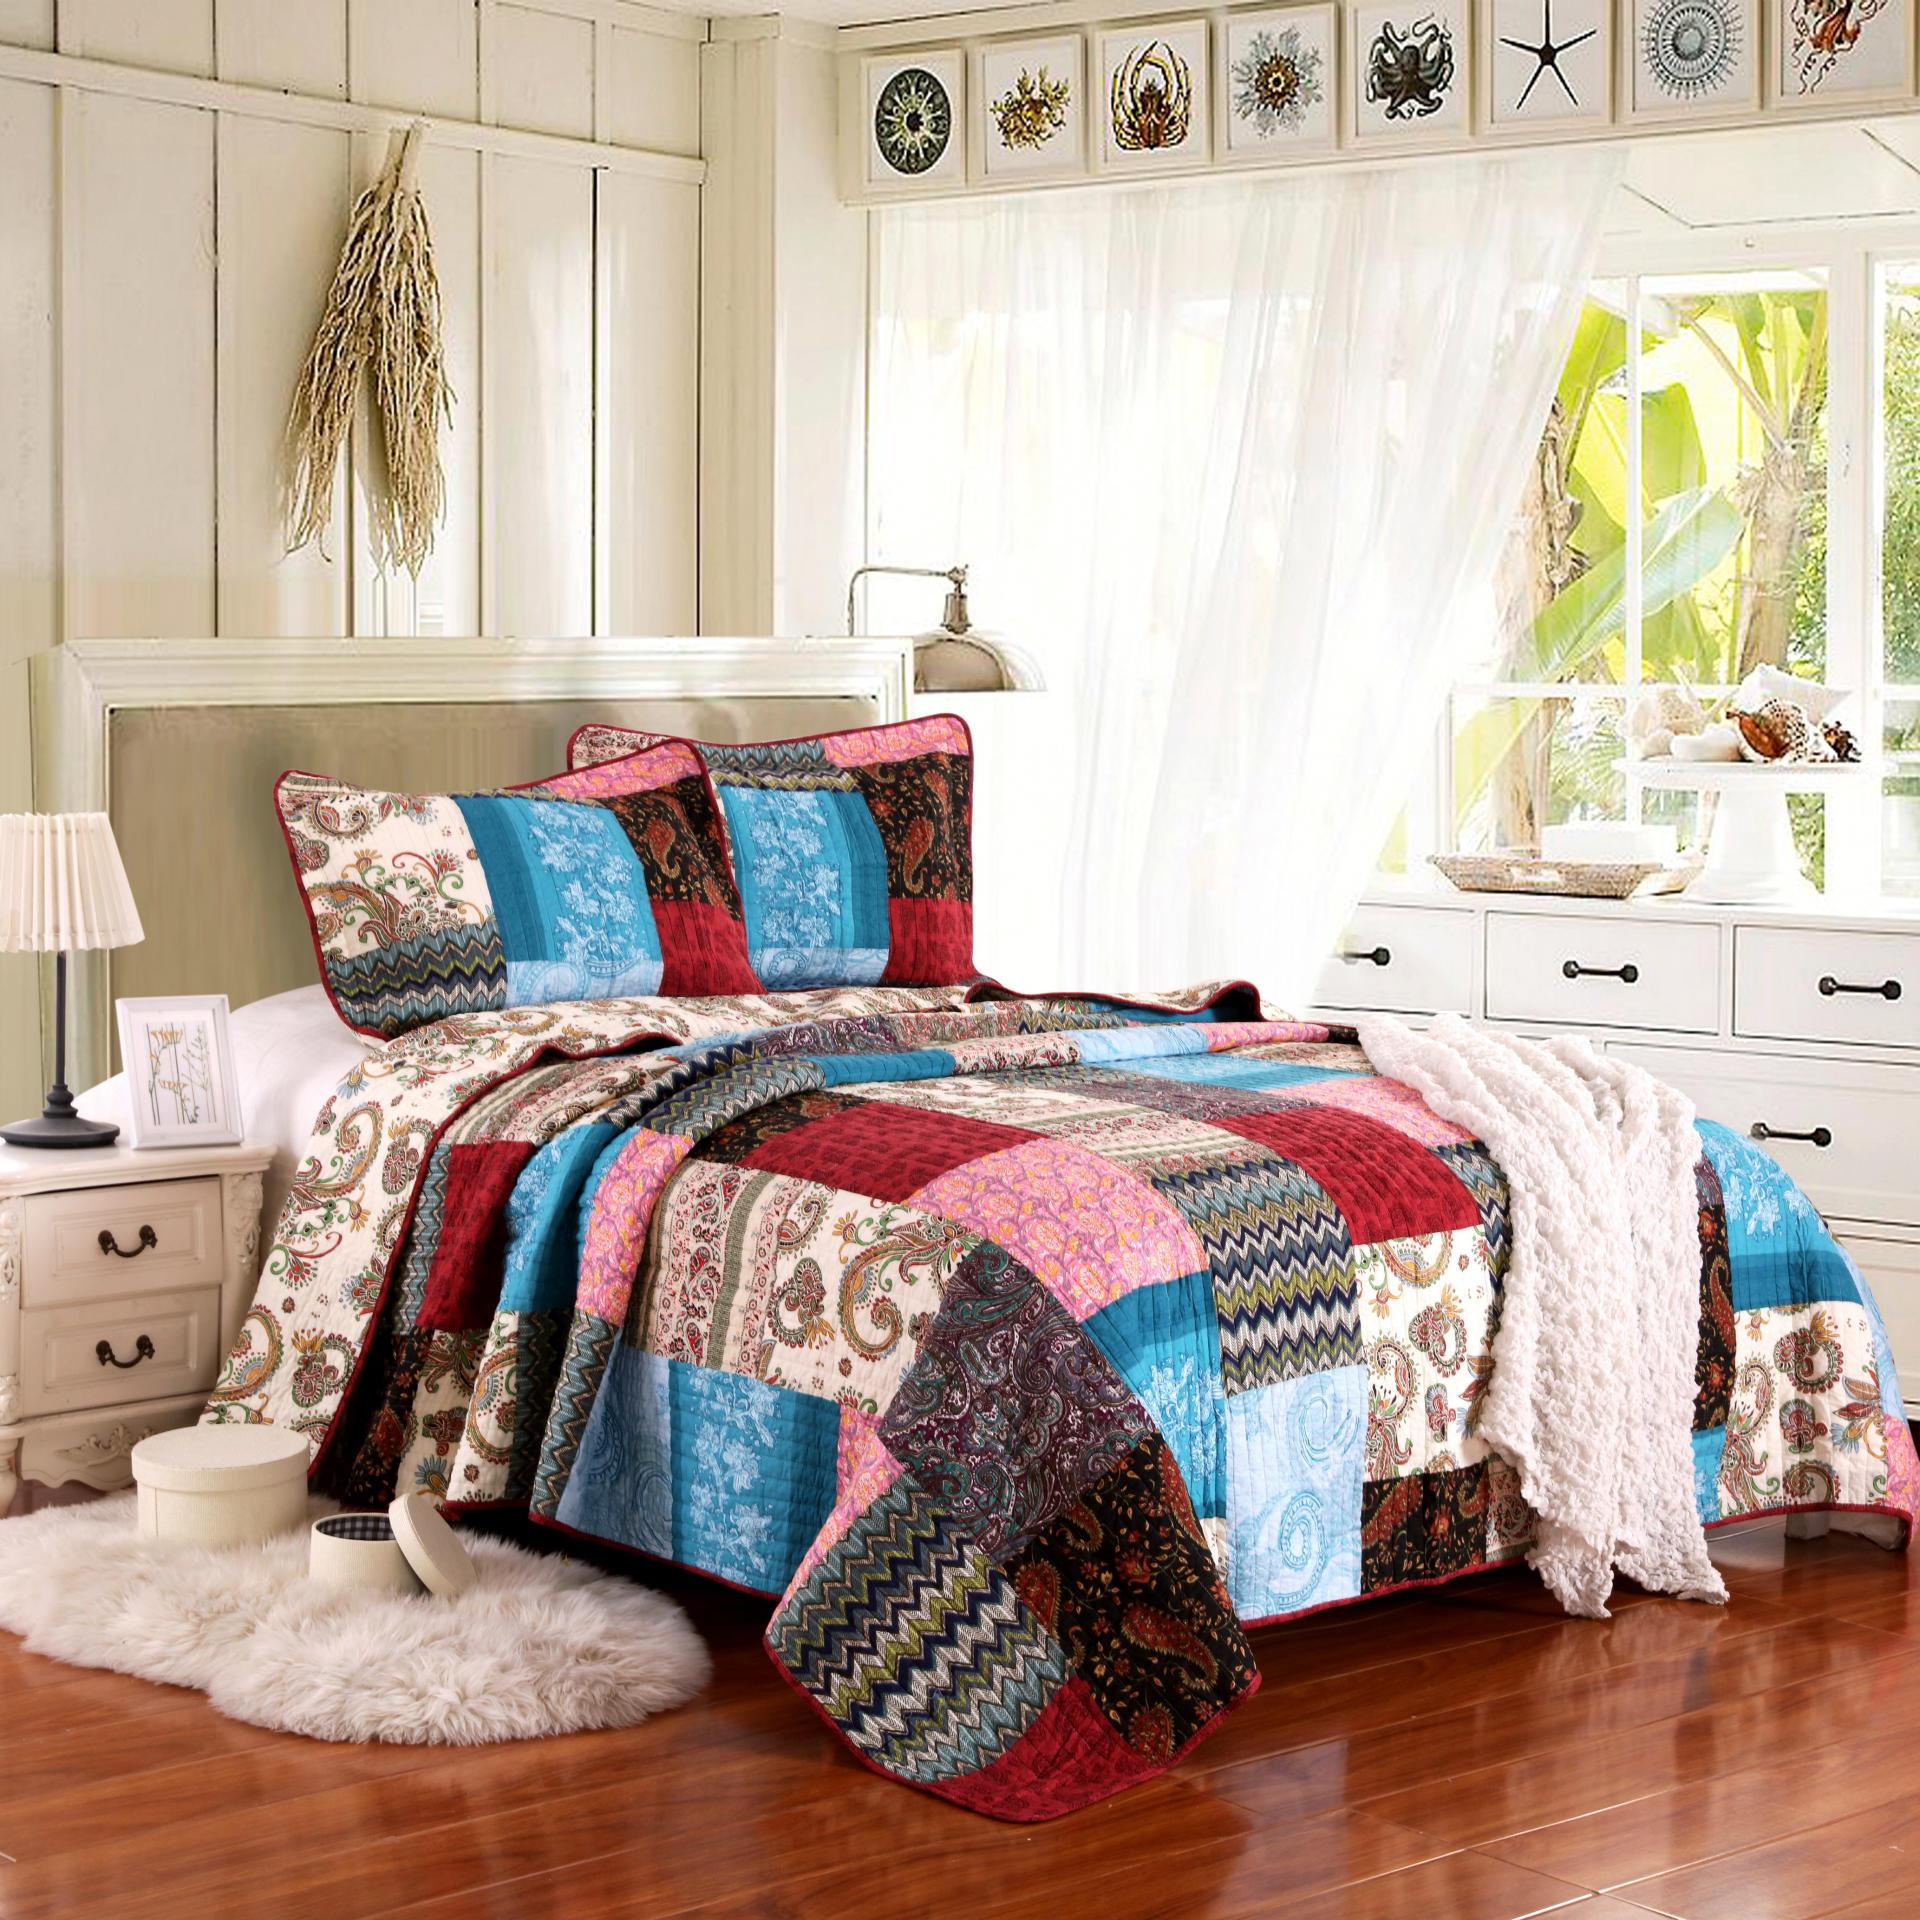 Famvotar 3pcs Luxury Quilt Bohemian Cotton Patchwork Quilted Coverlet Bedspread Bright Vibrant Floral Paisley Bedding Set Queen